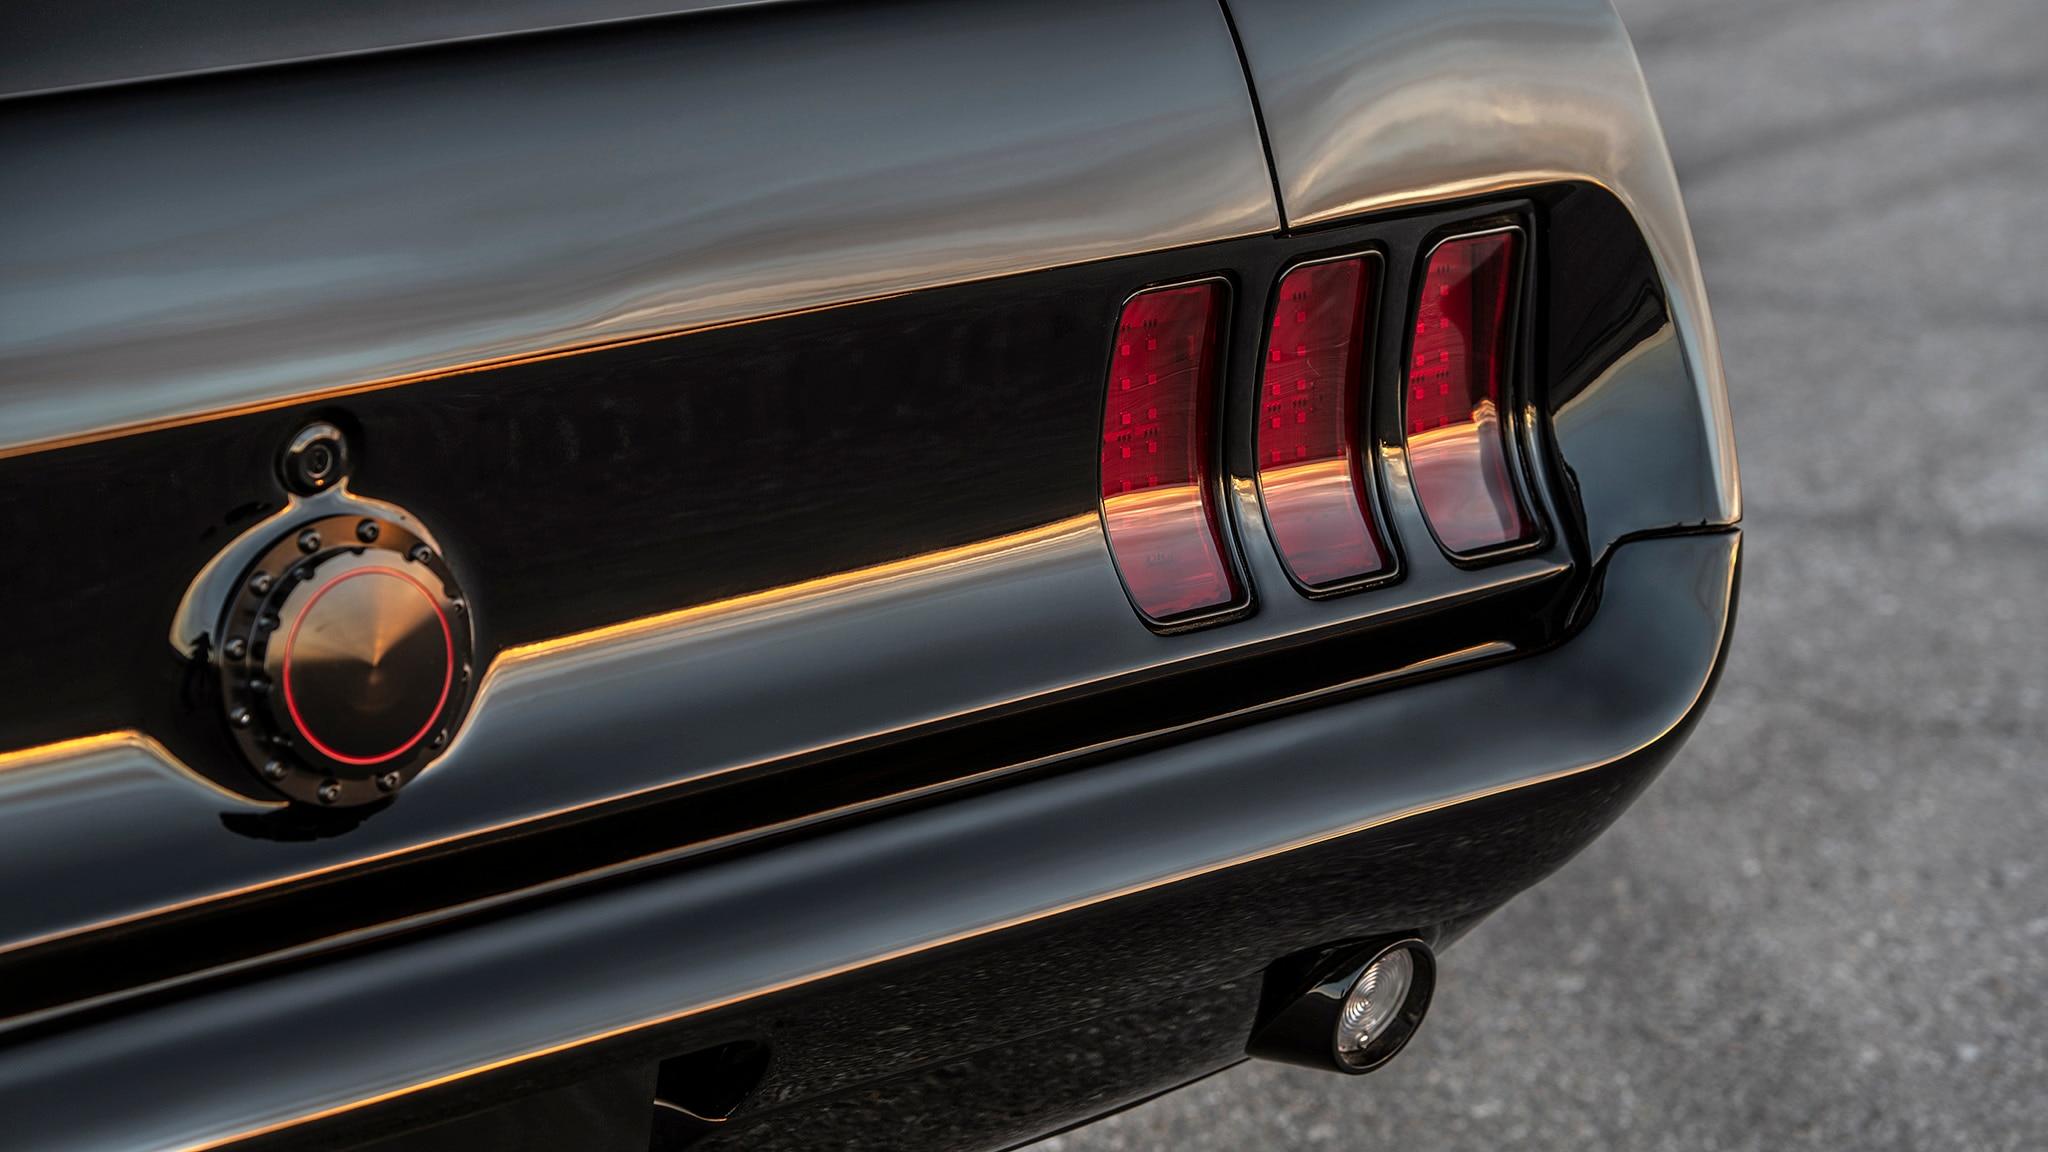 18 Classic Recreations 1969 Boss 429 Mustang